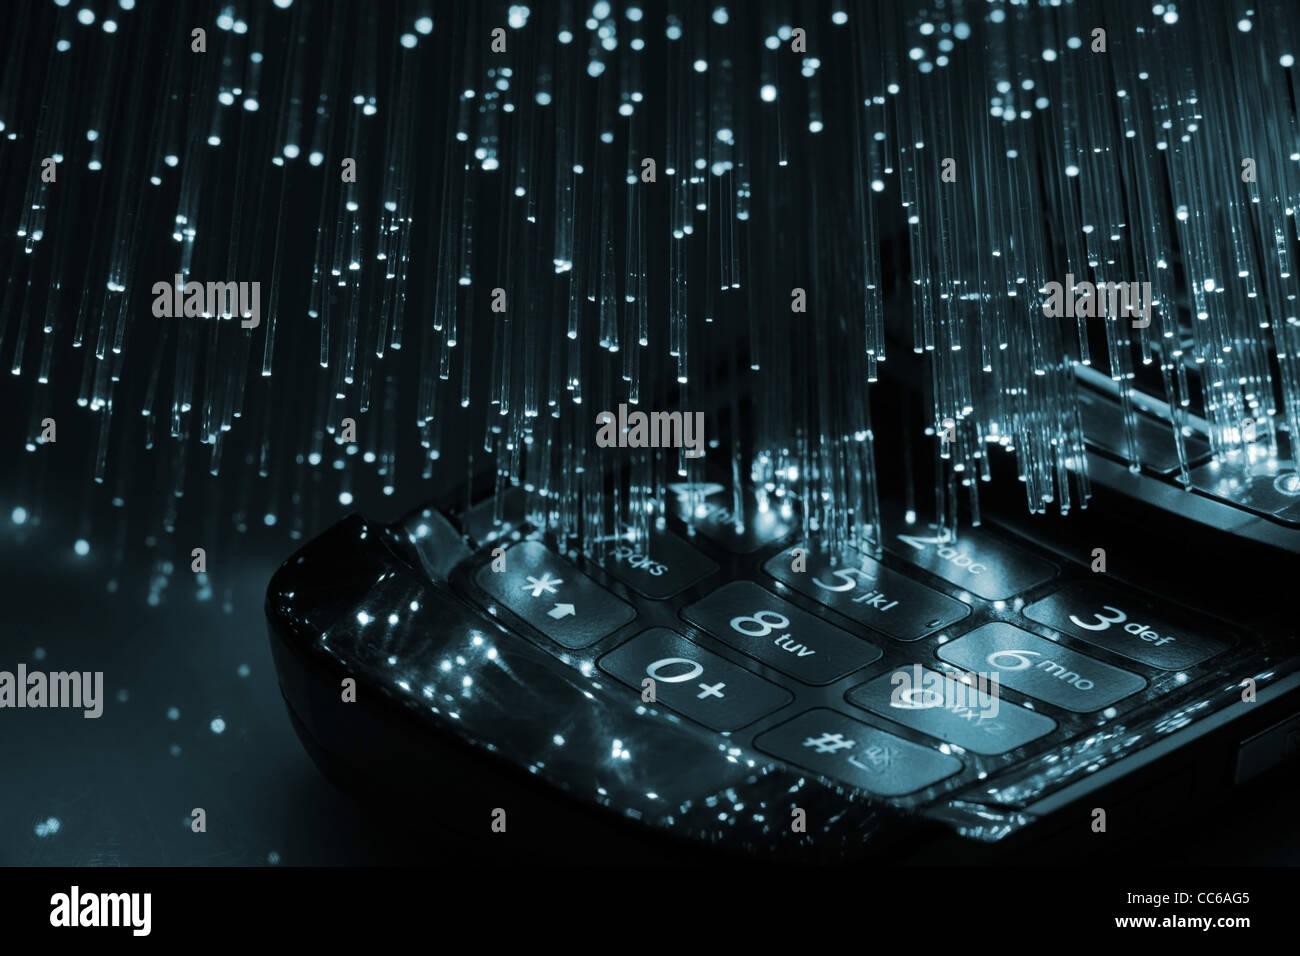 Fiber optics background with lots of blue light spots - Stock Image